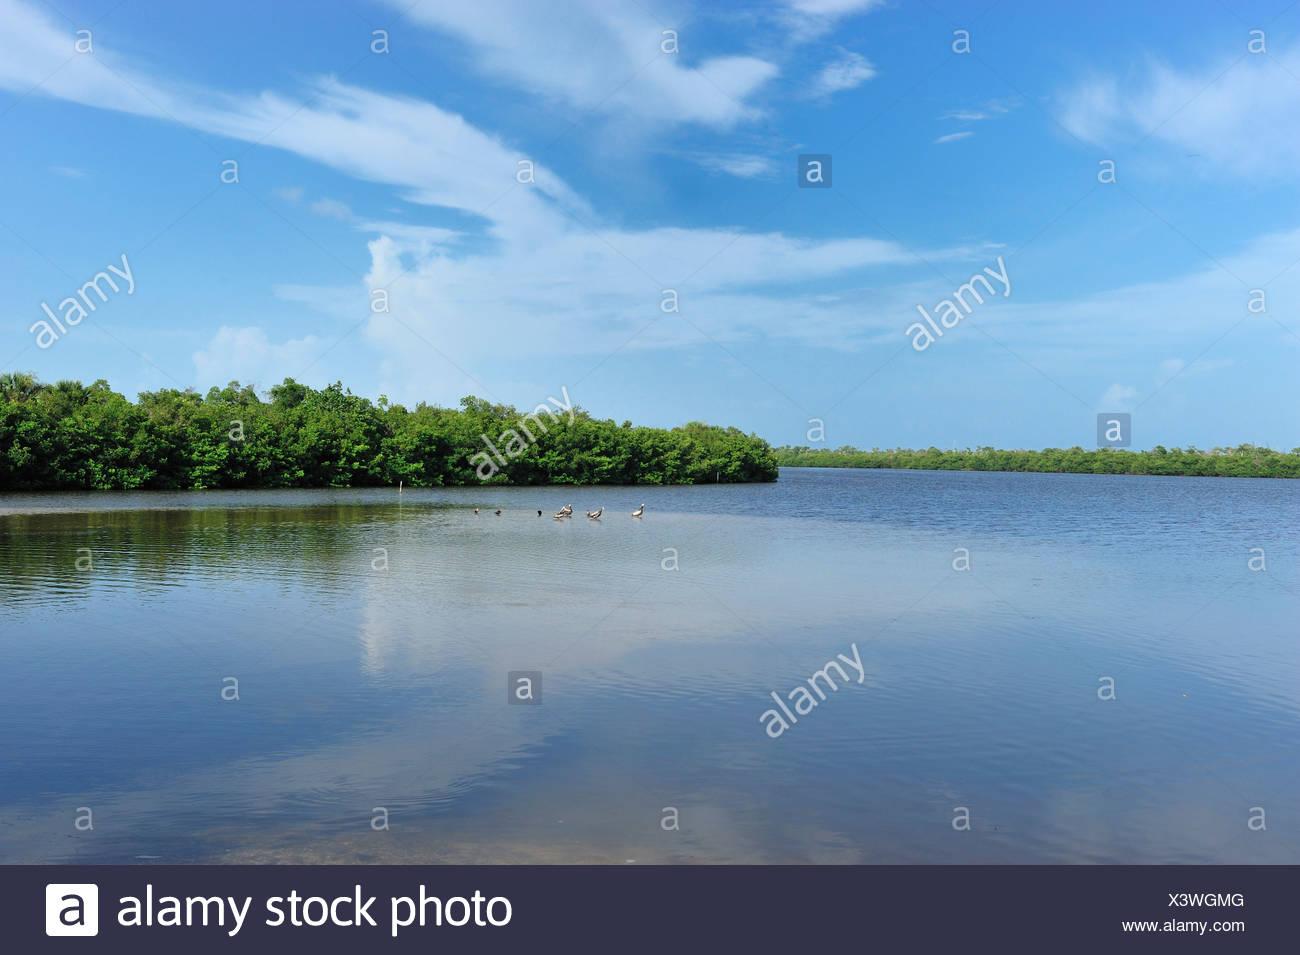 J. N. Ding Darling, National Wildlife Refuge, water, trees - Stock Image